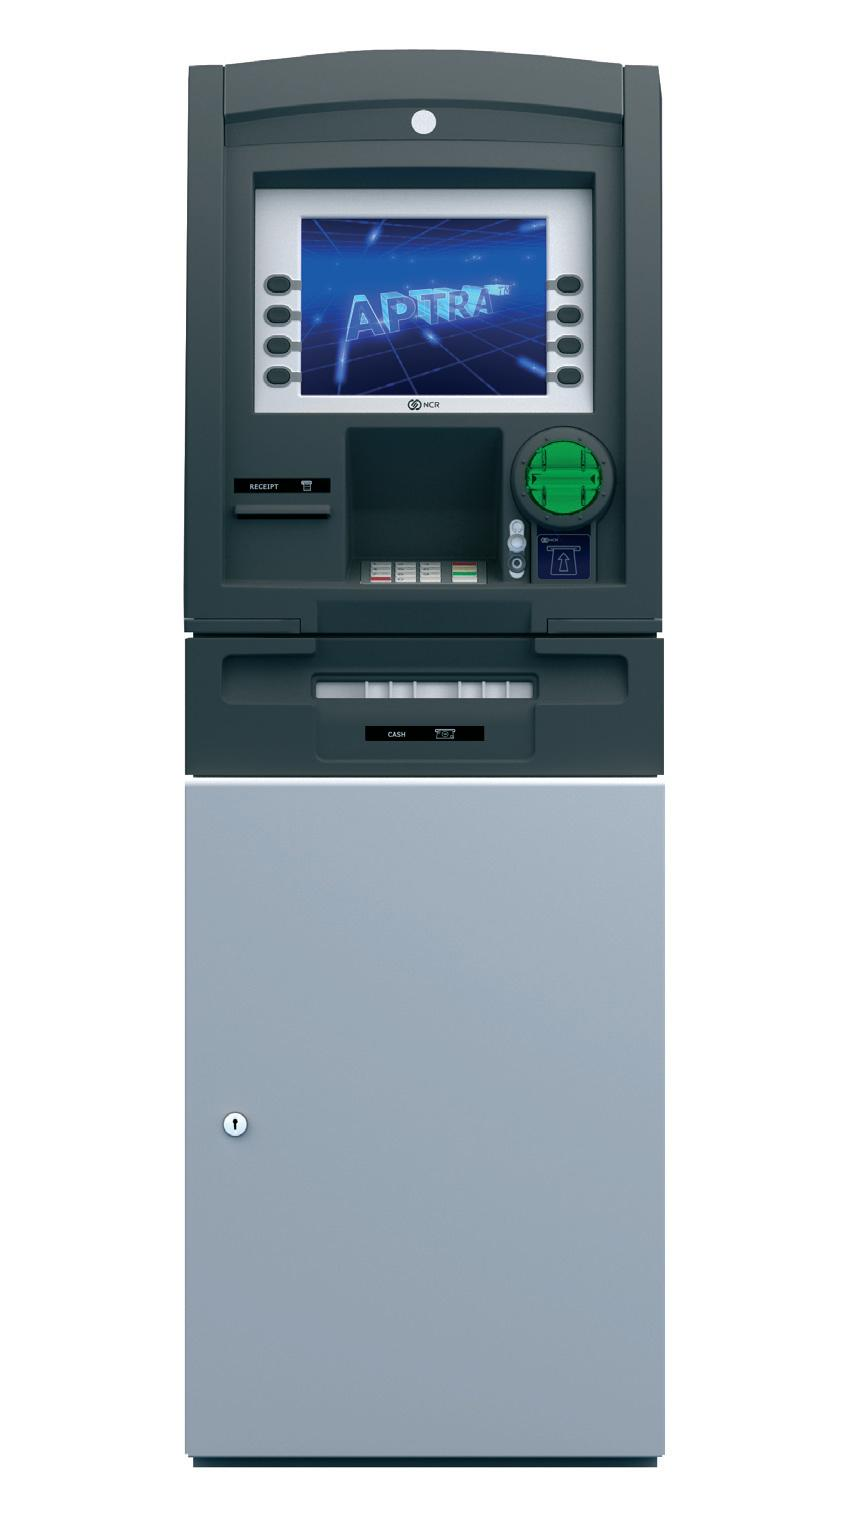 ncr atm machine